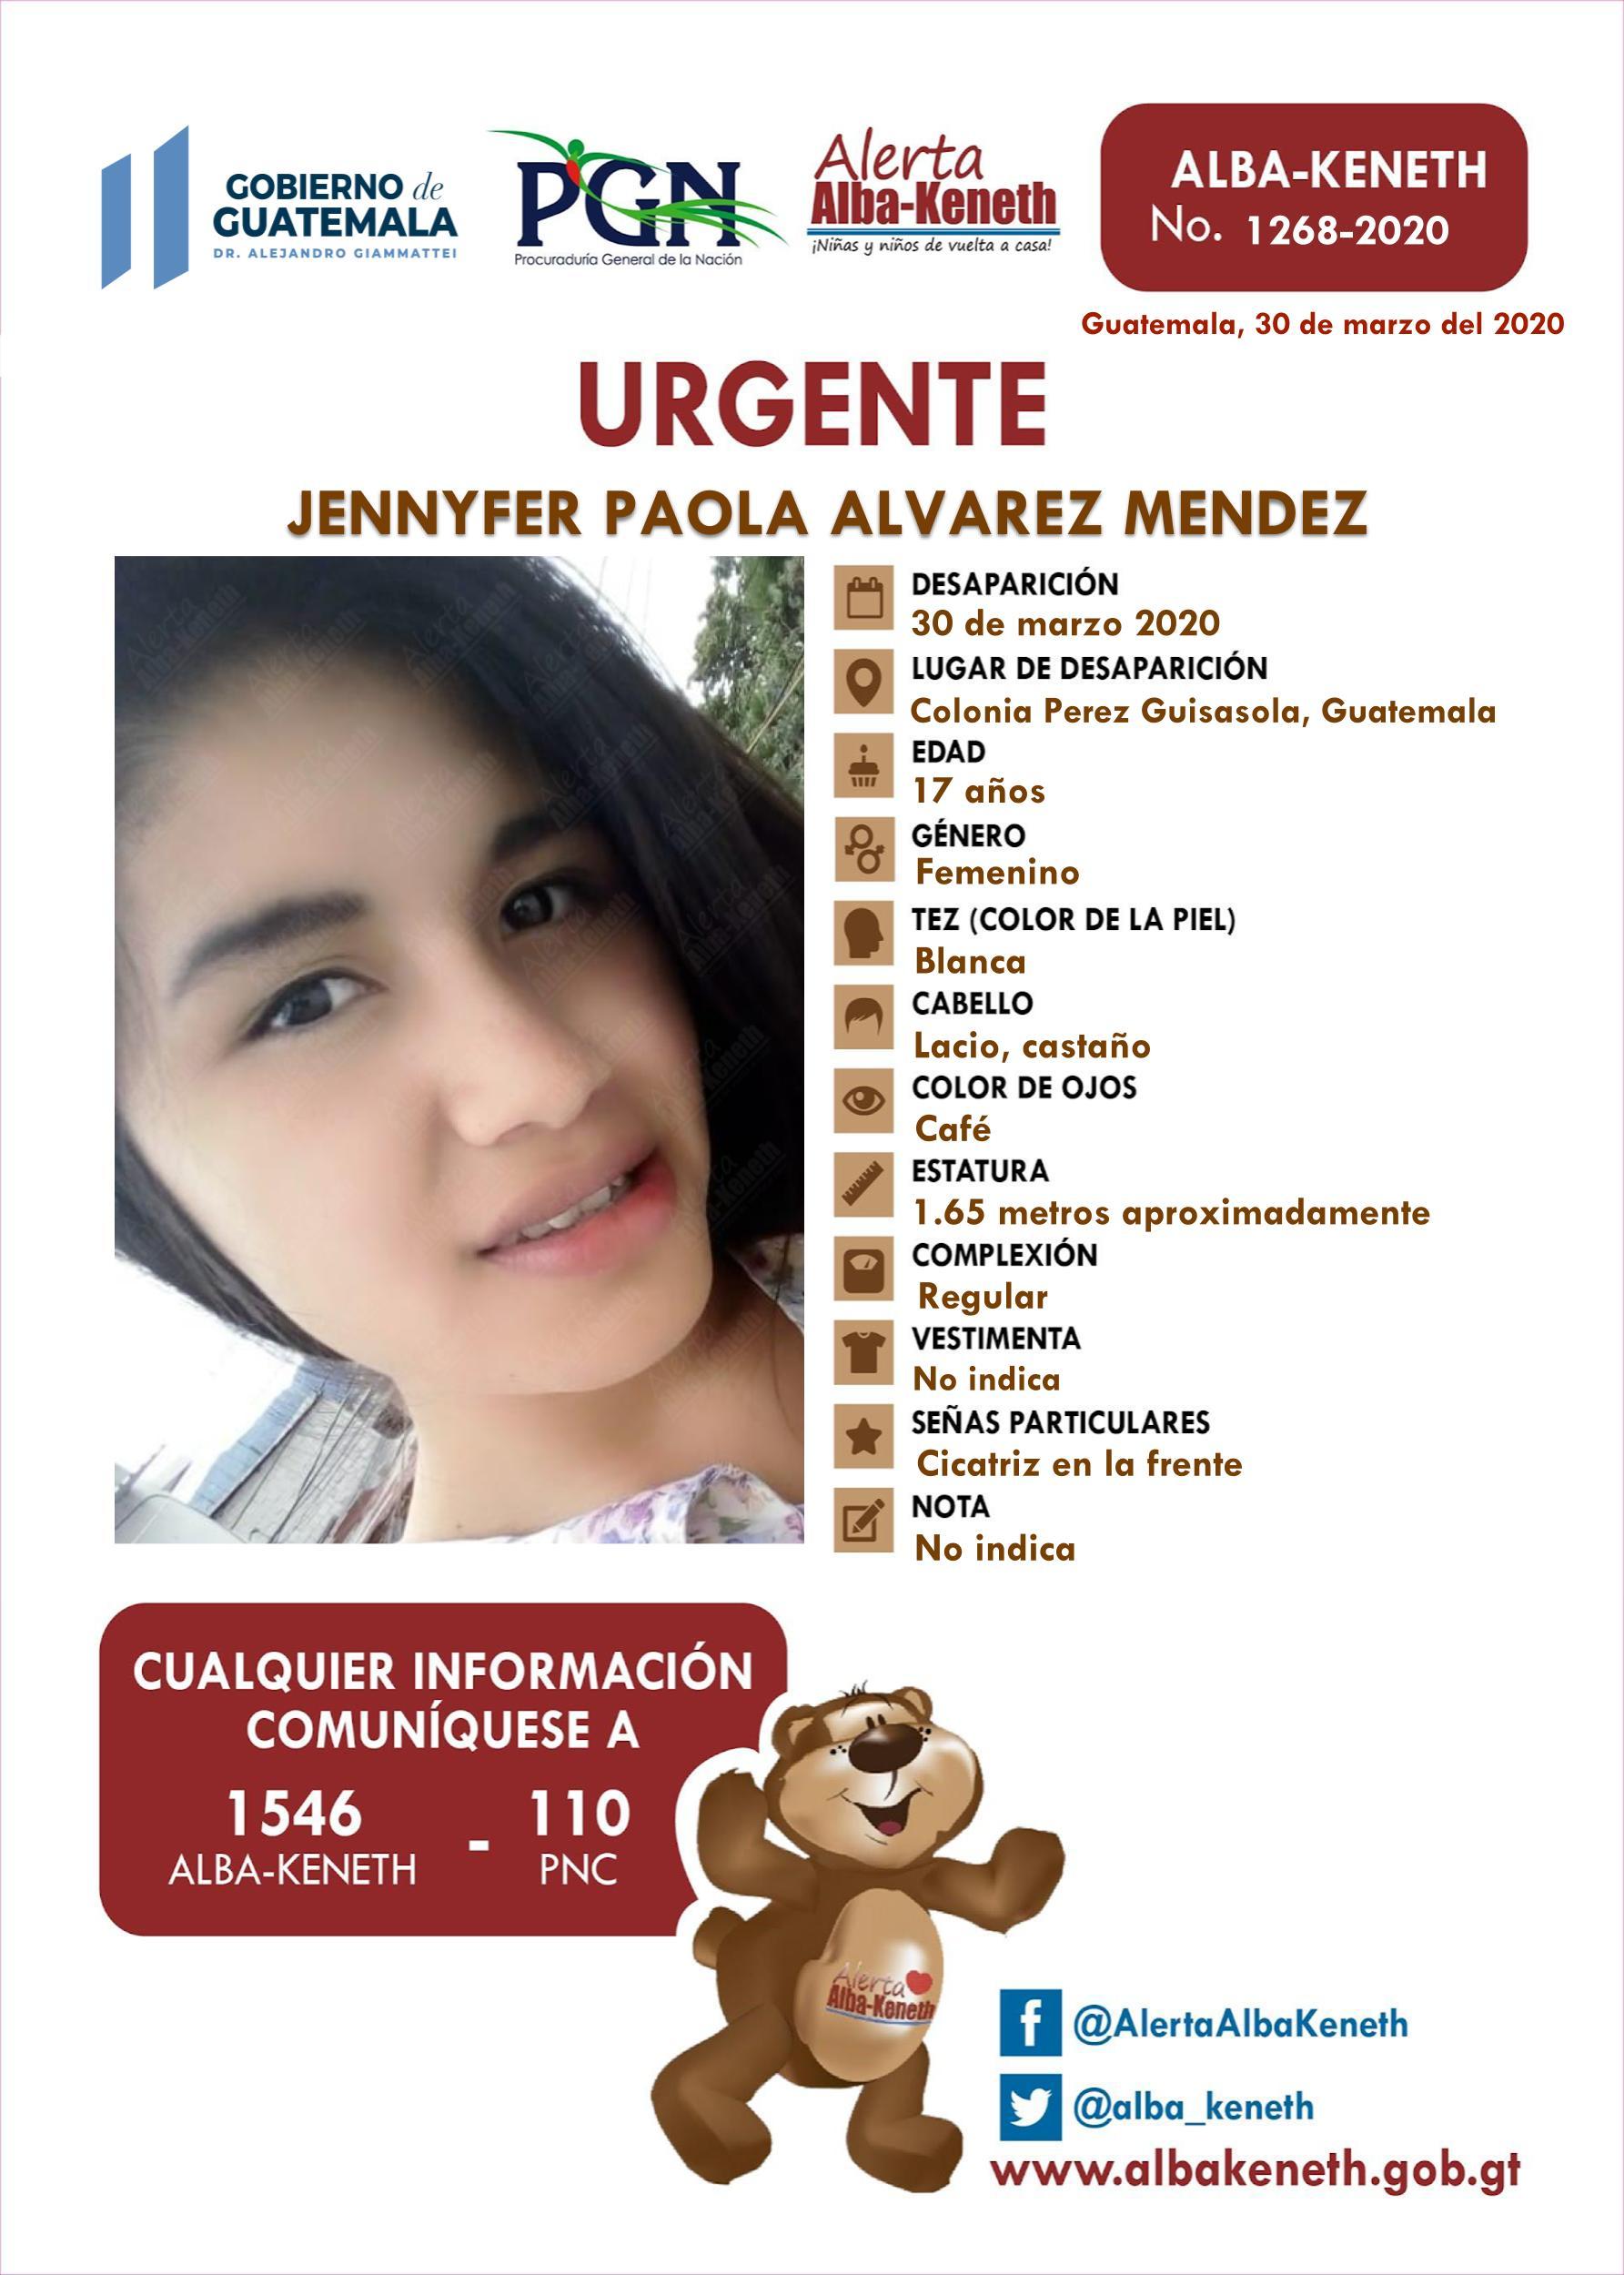 Jennyfer Paola Alvarez Mendez